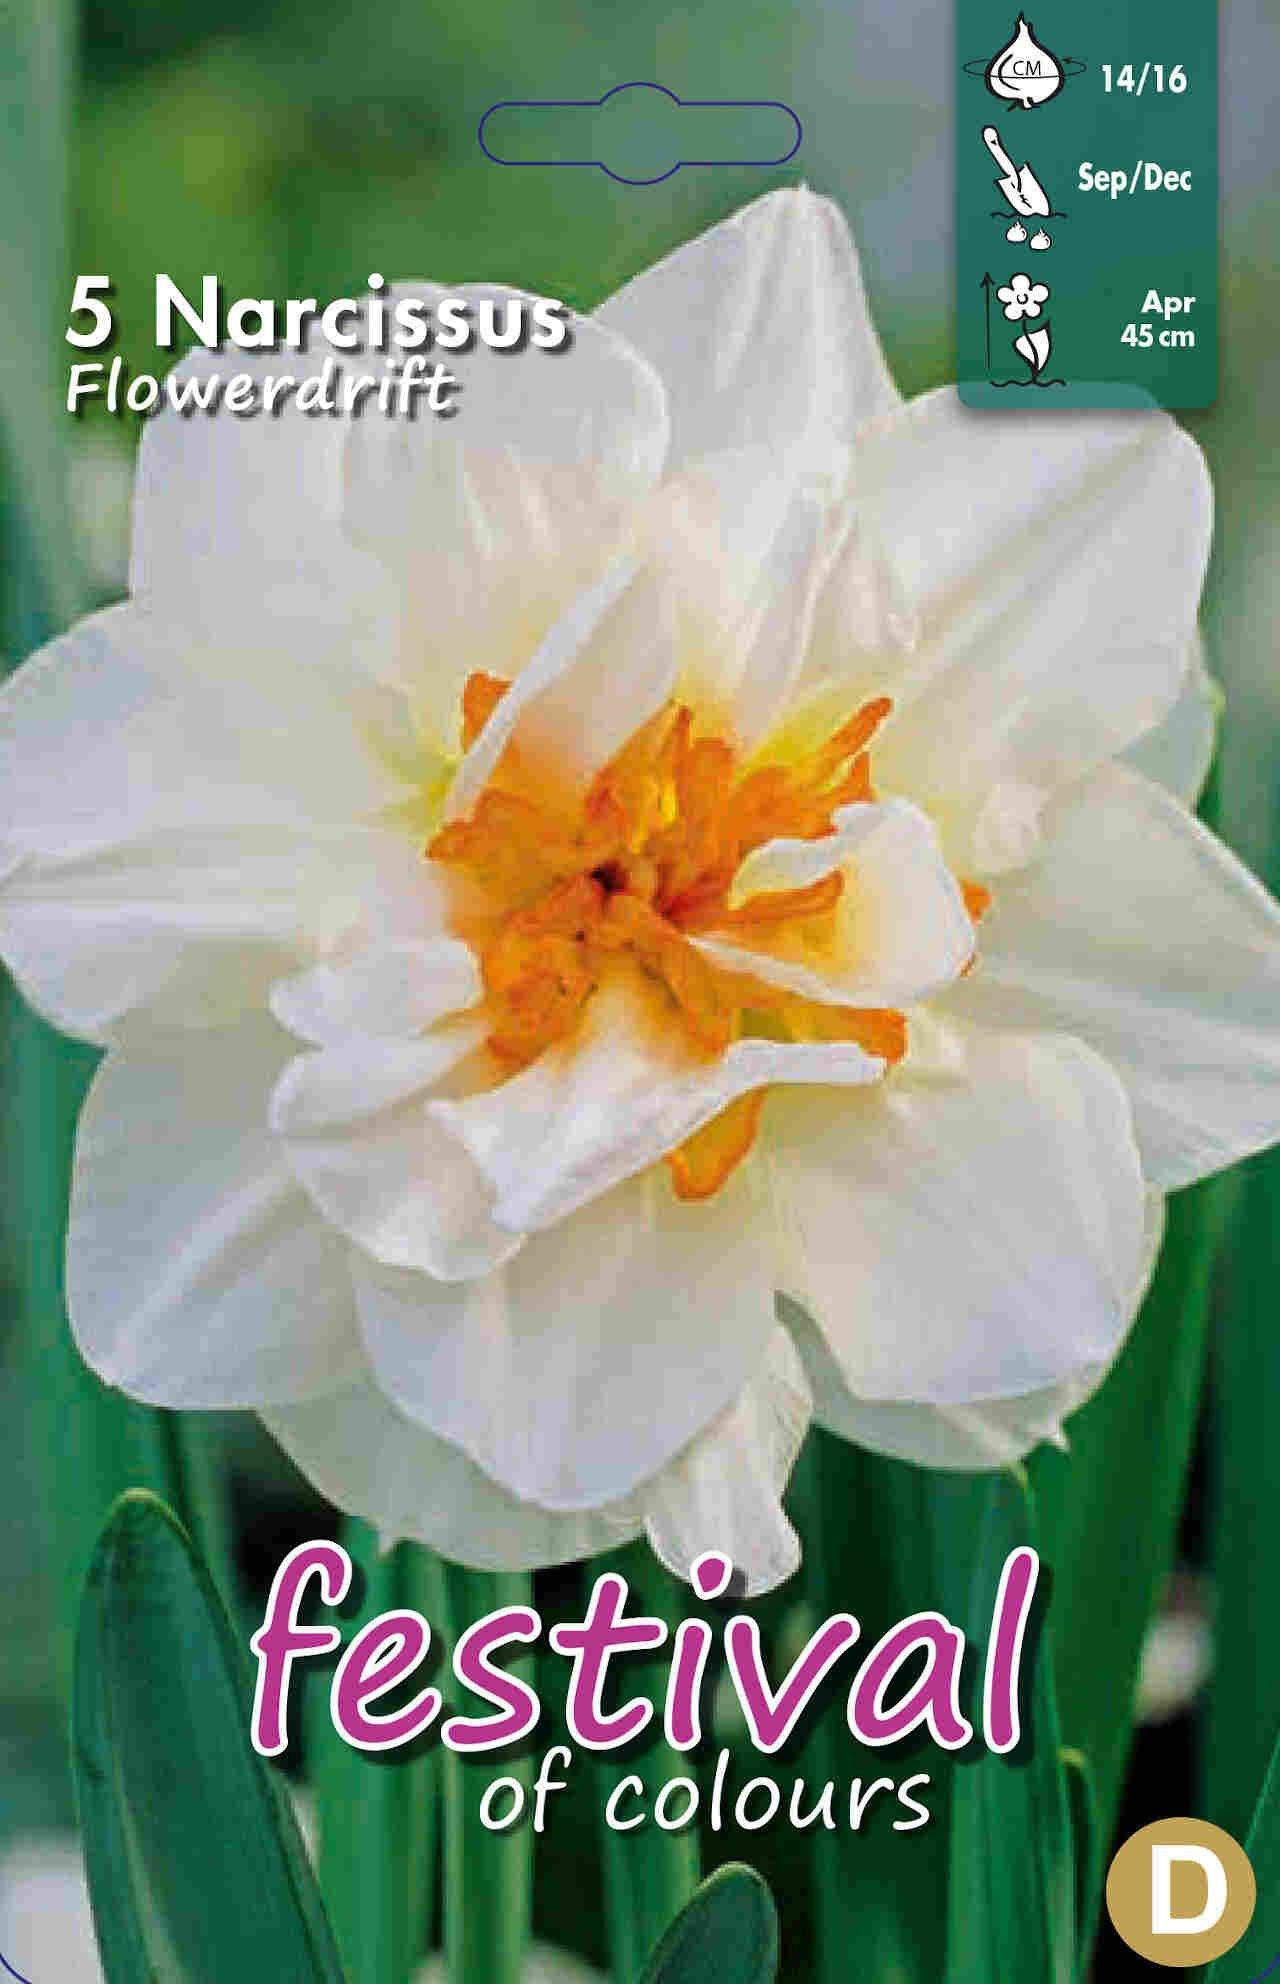 Påskeliljeløg - Narcissus Flower Drift 14/16